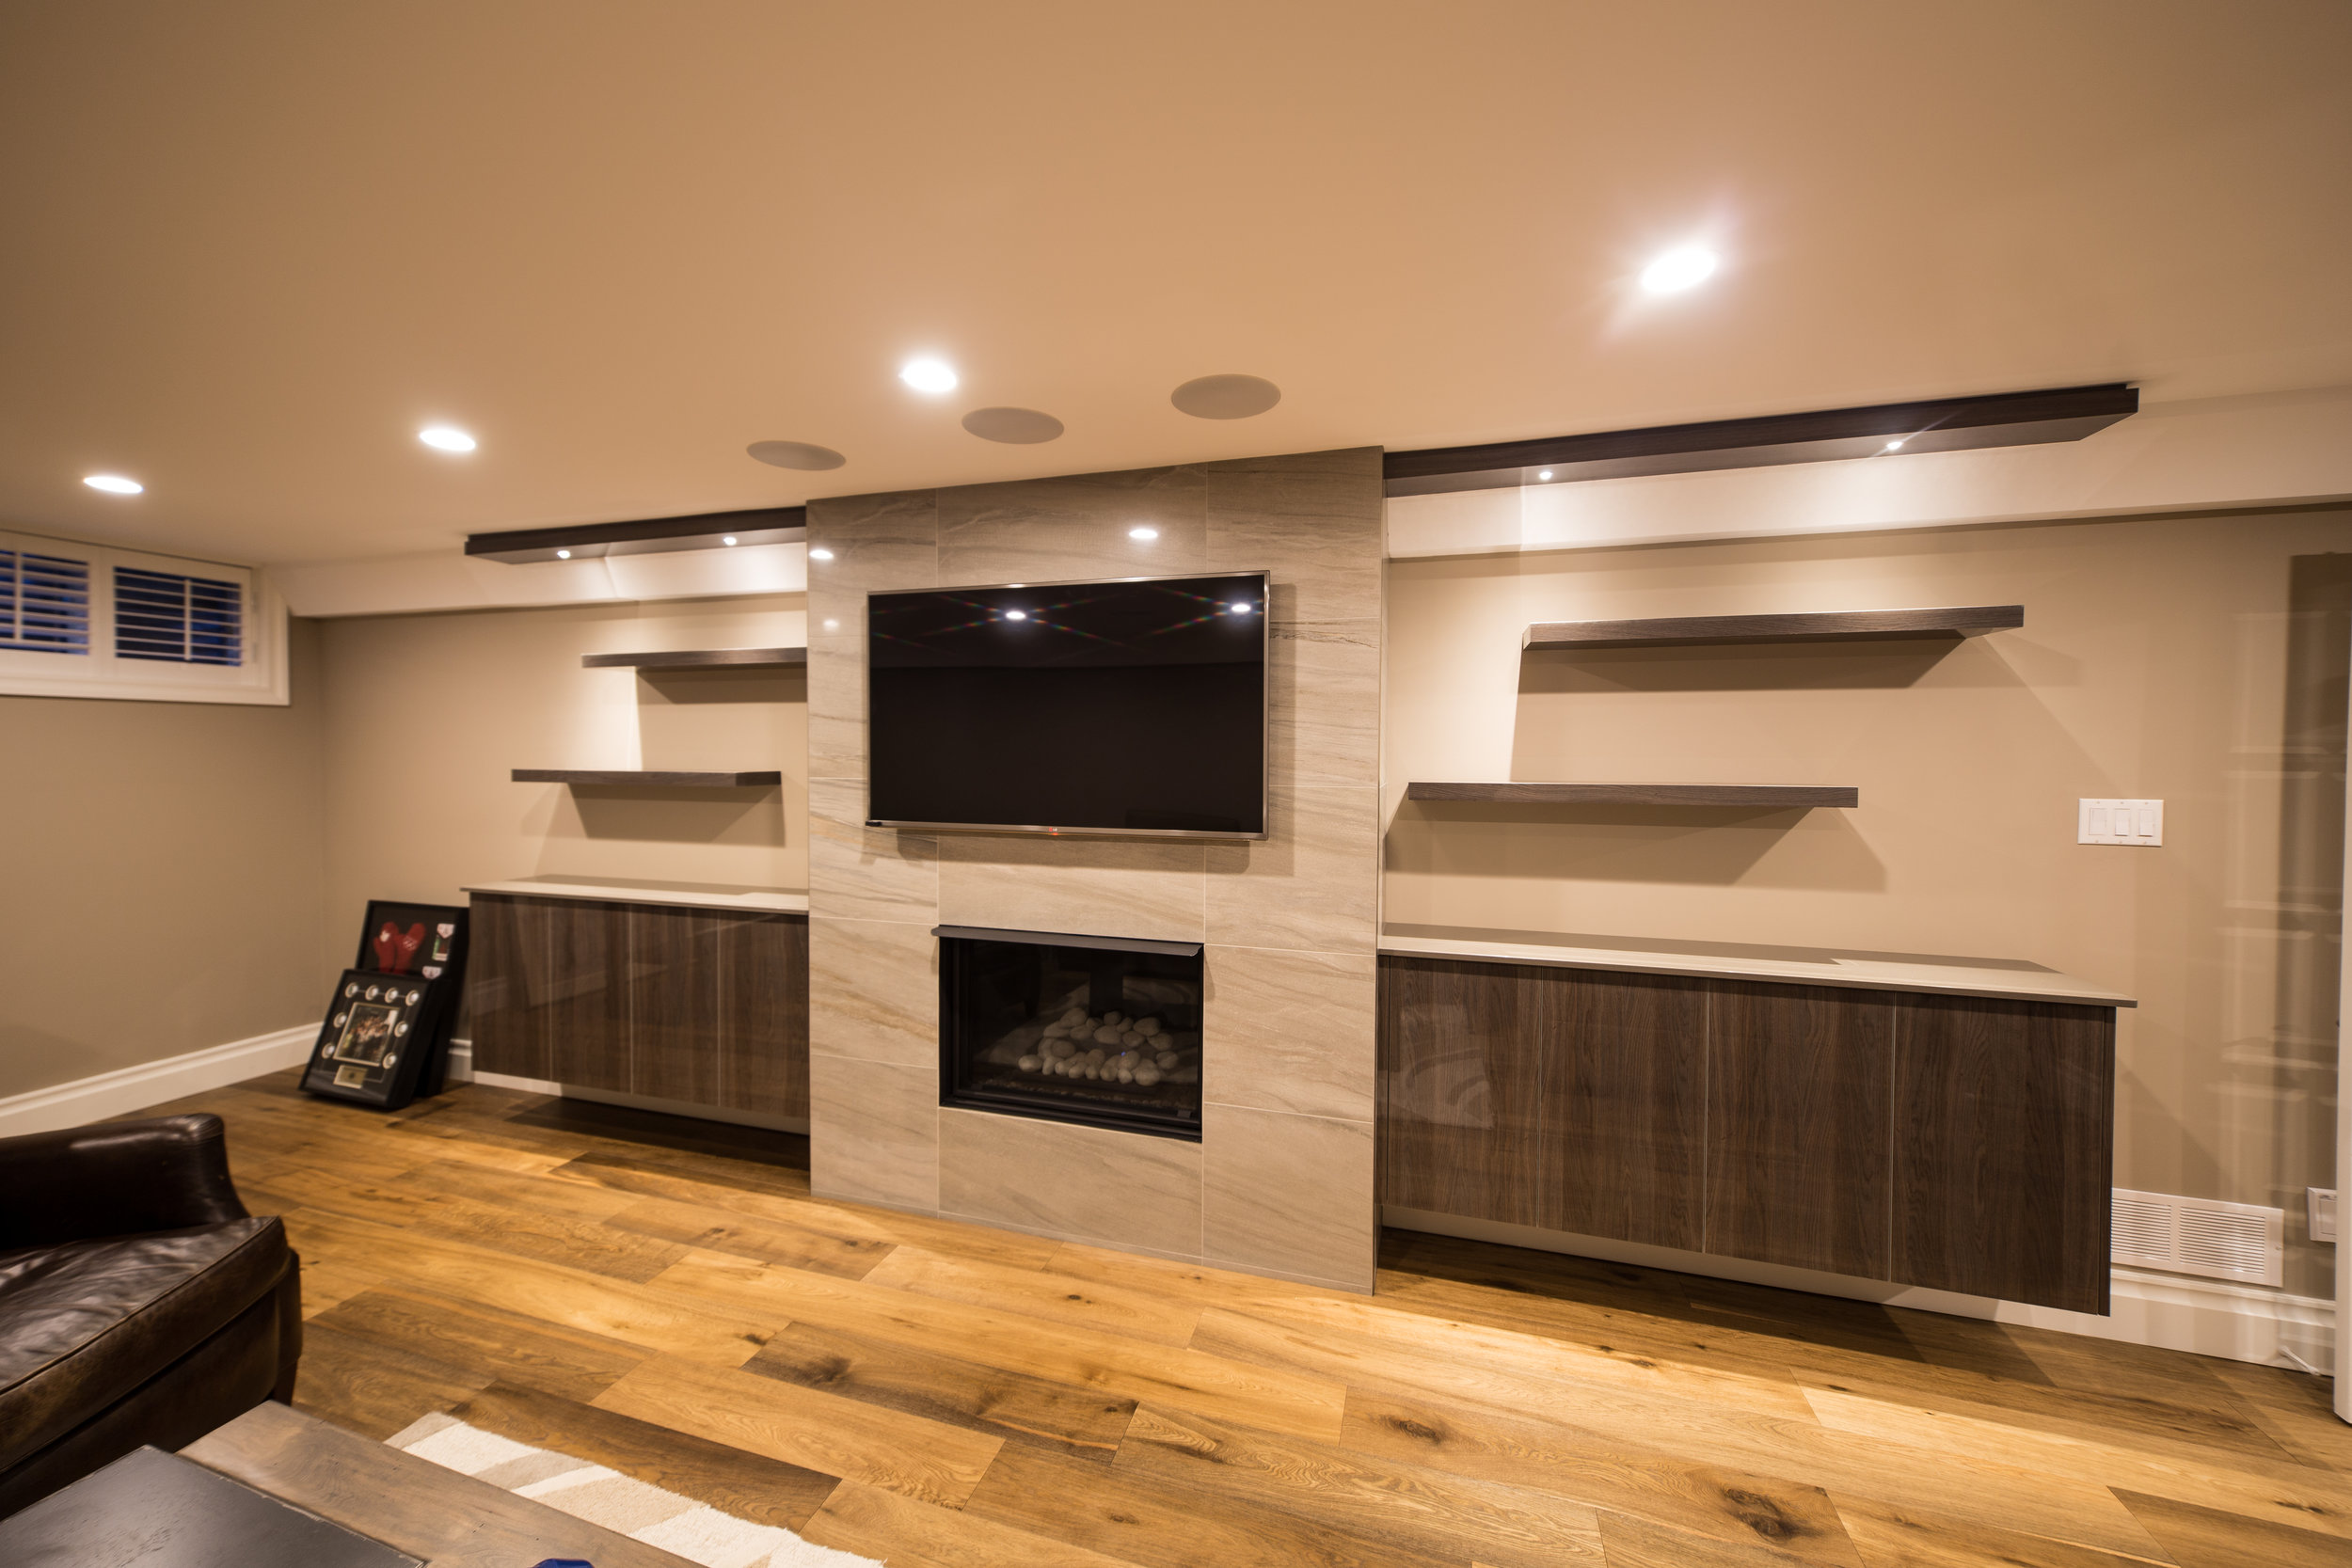 Riverside Fireplace Project